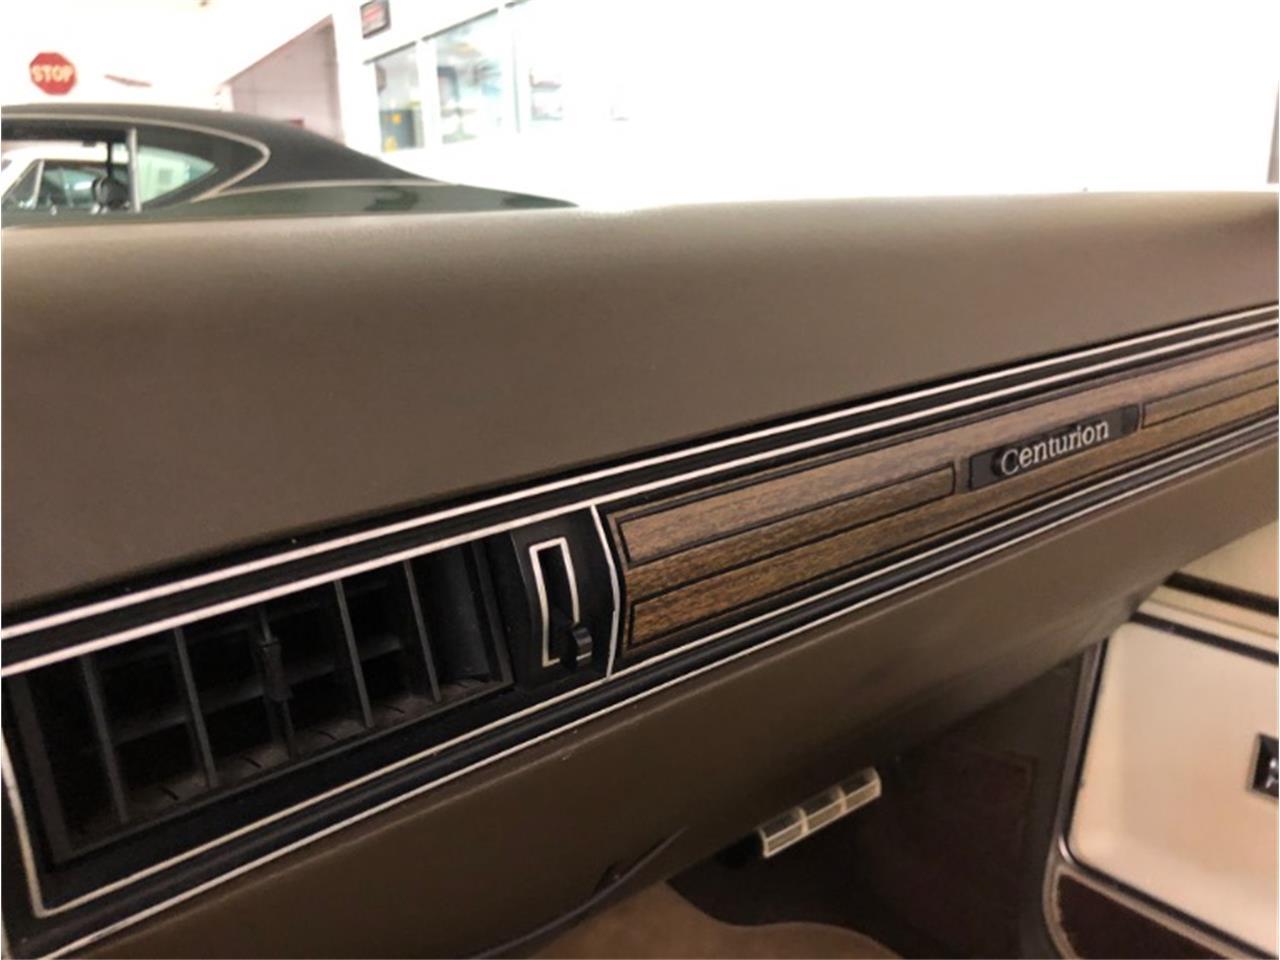 Large Picture of Classic 1973 Buick Centurion - $14,750.00 - Q4OZ